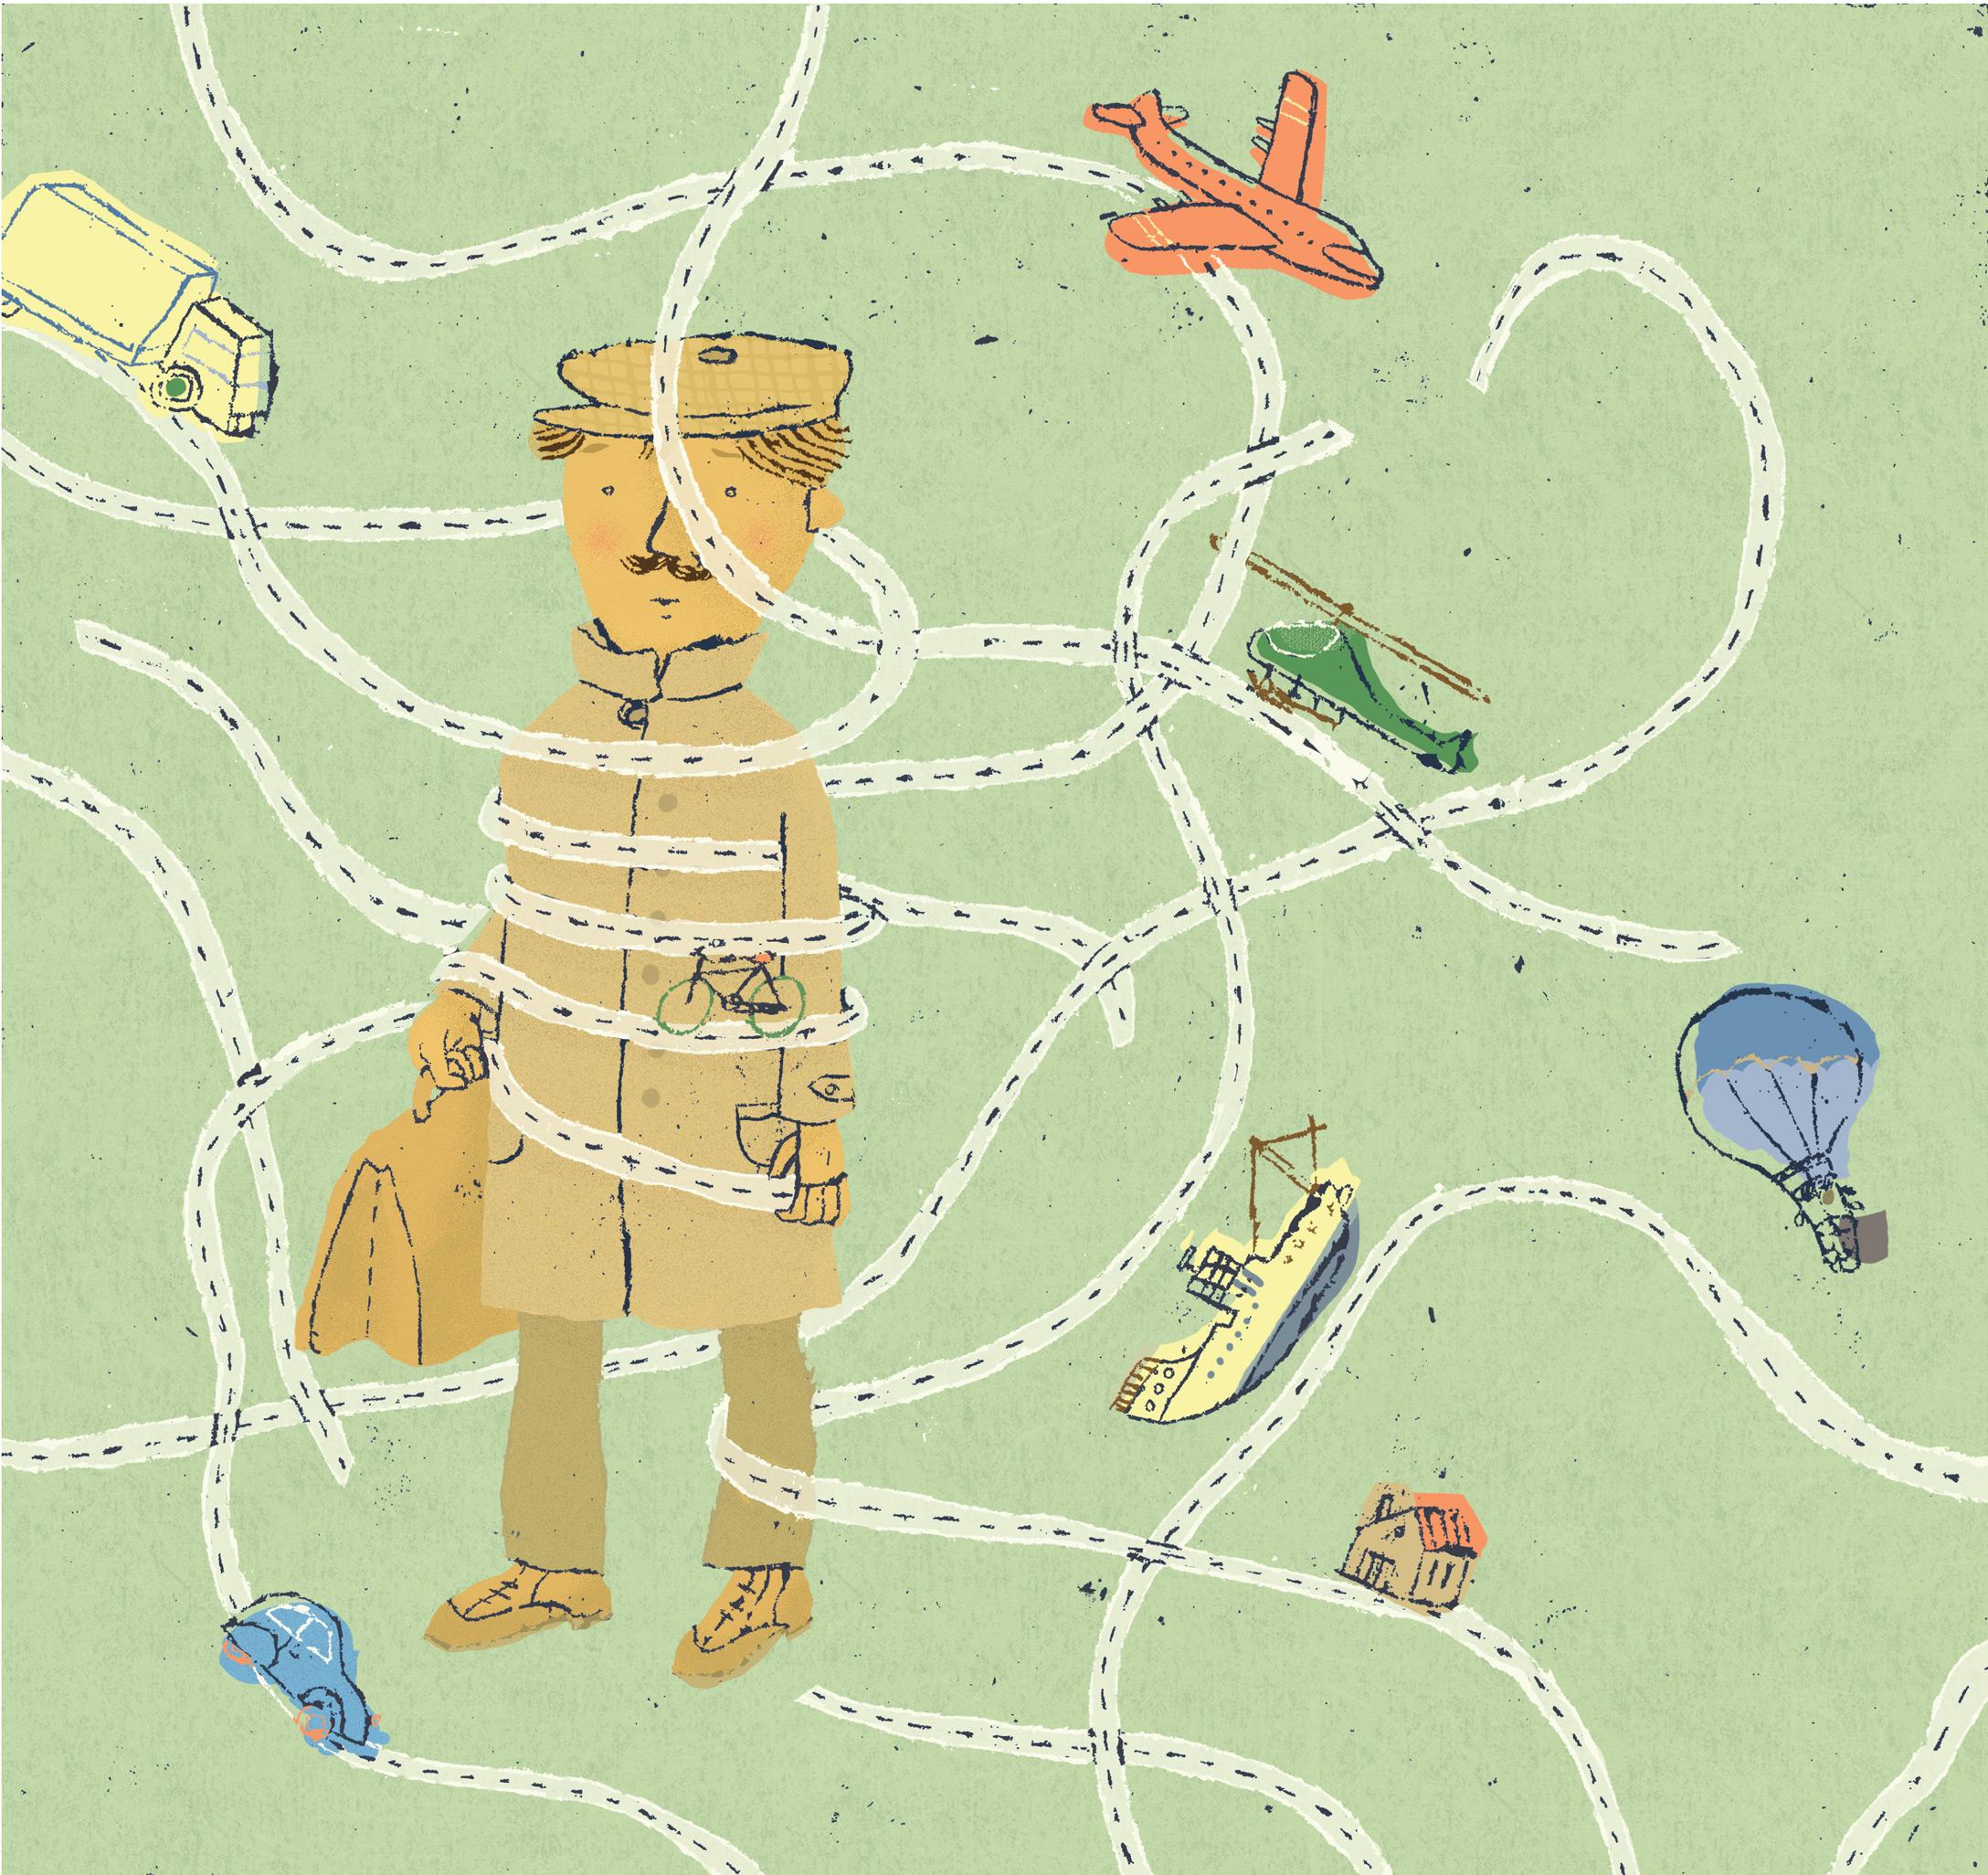 Annalisa Papagna illustration - Away on business